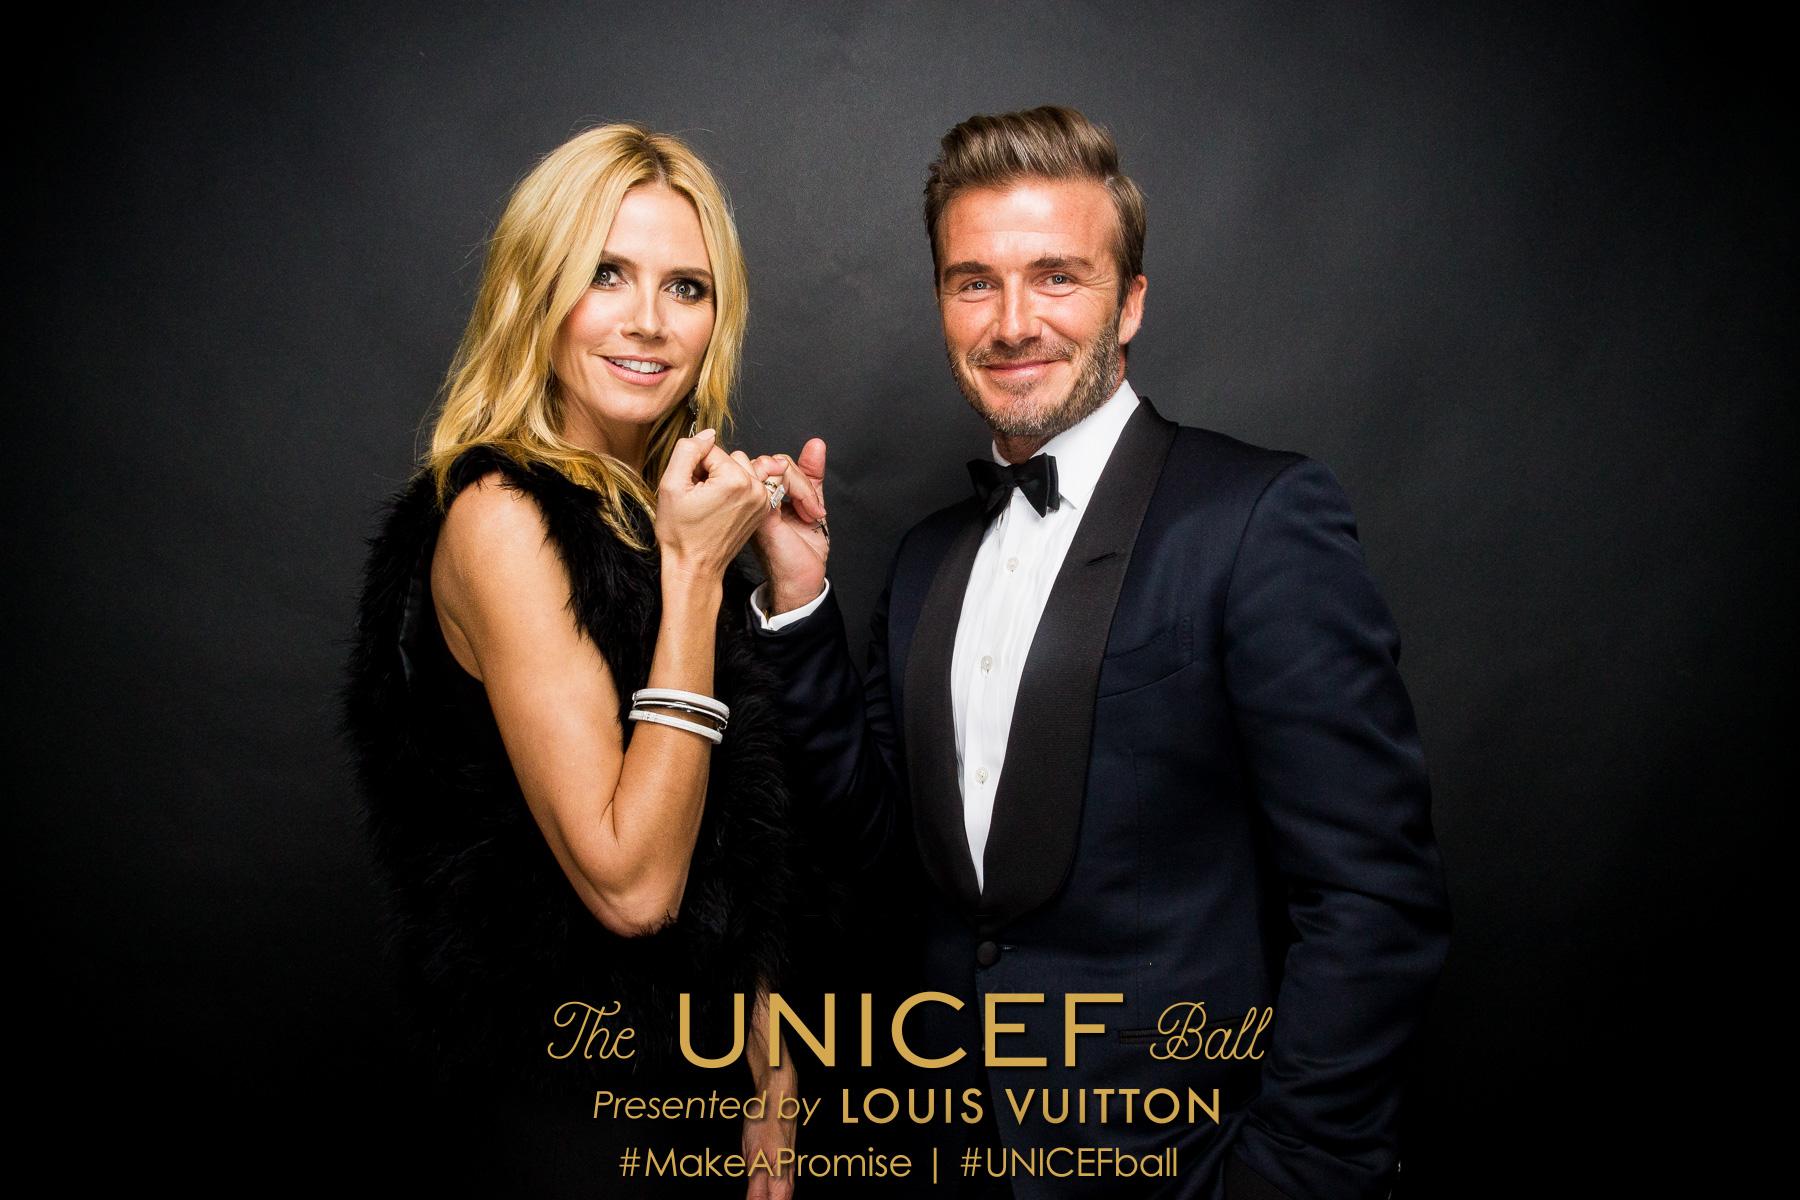 UNICEF Ambassador Heidi Klum and UNICEF Goodwill Ambassador David Beckham at the 2016 UNICEF Ball presented by Louis Vuitton